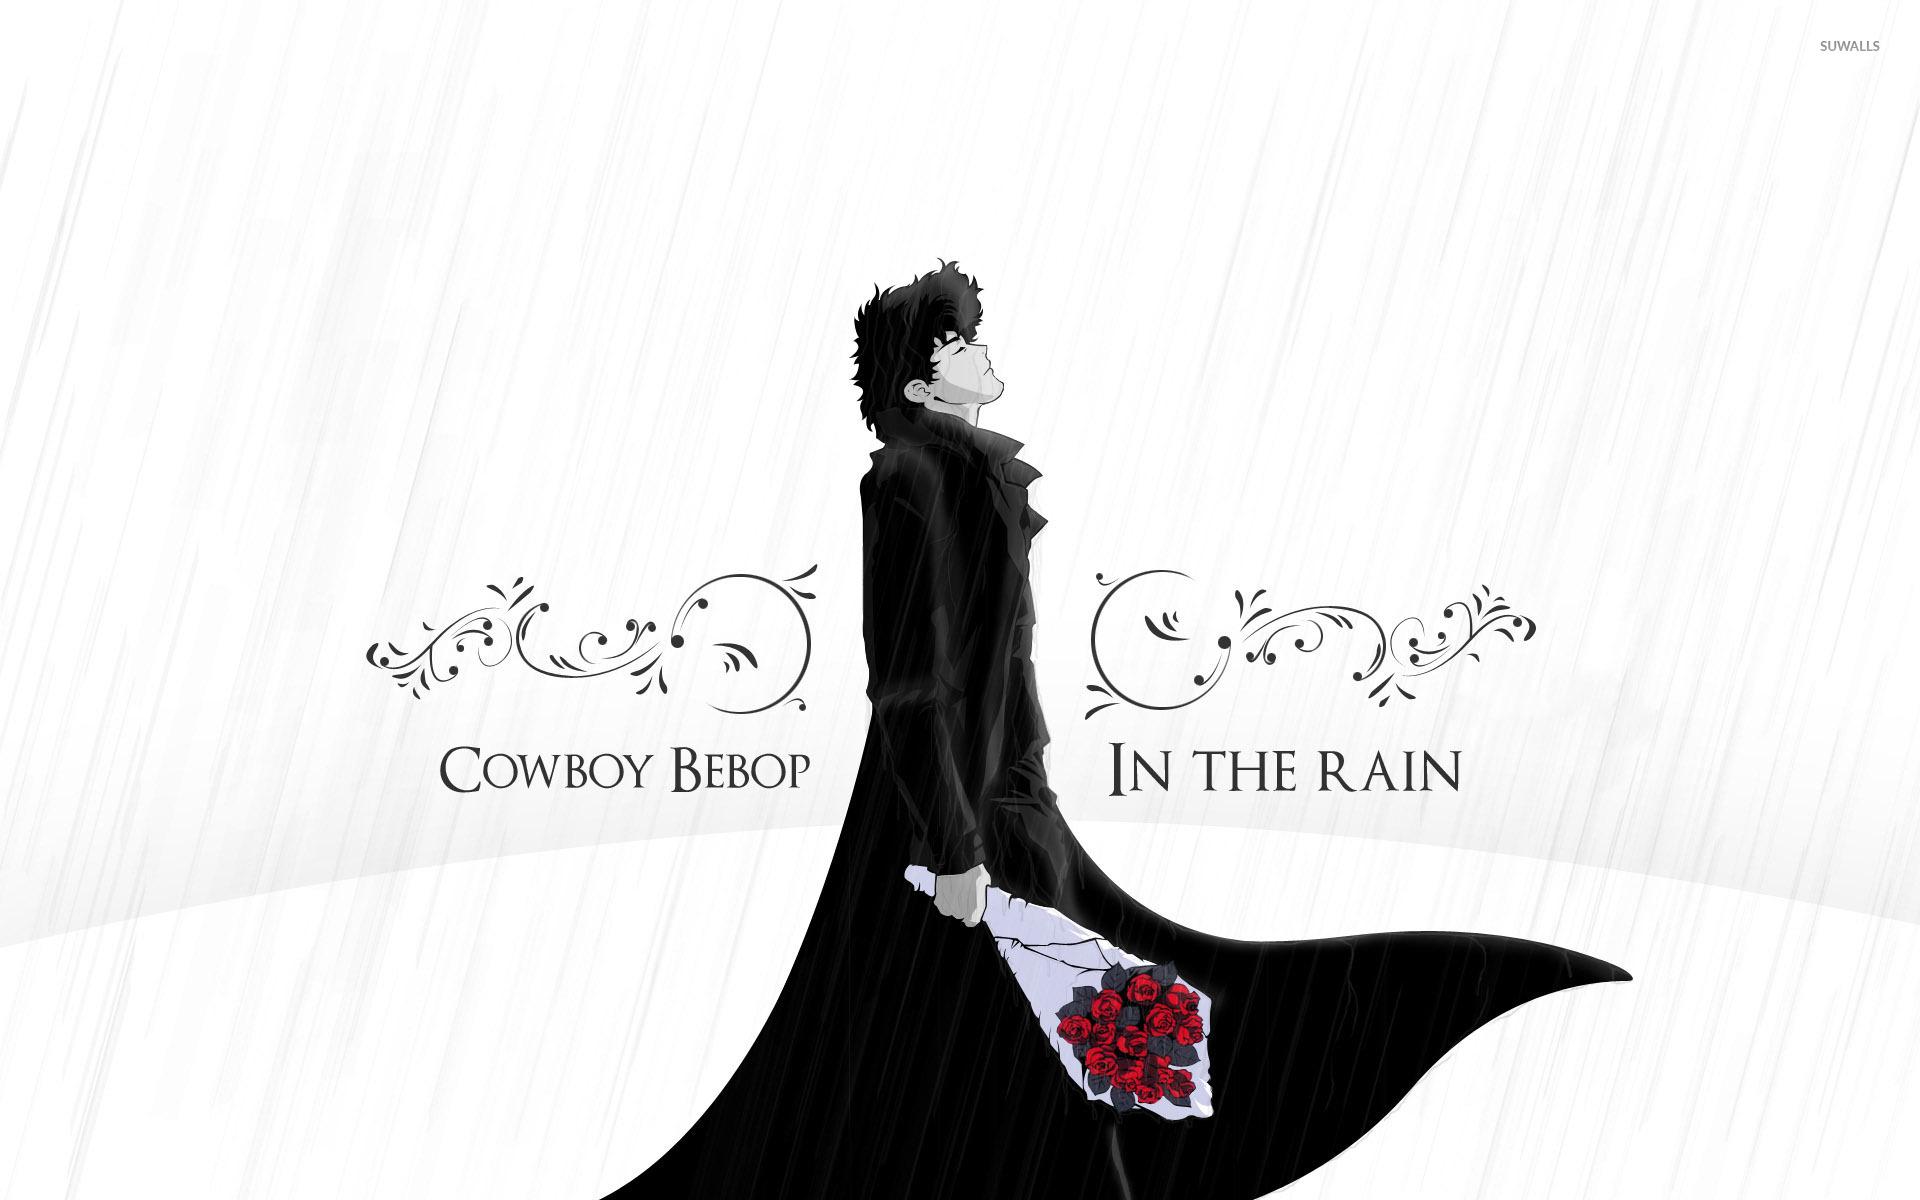 Spike Spiegel With A Red Rose Bouquet Cowboy Bebop Wallpaper